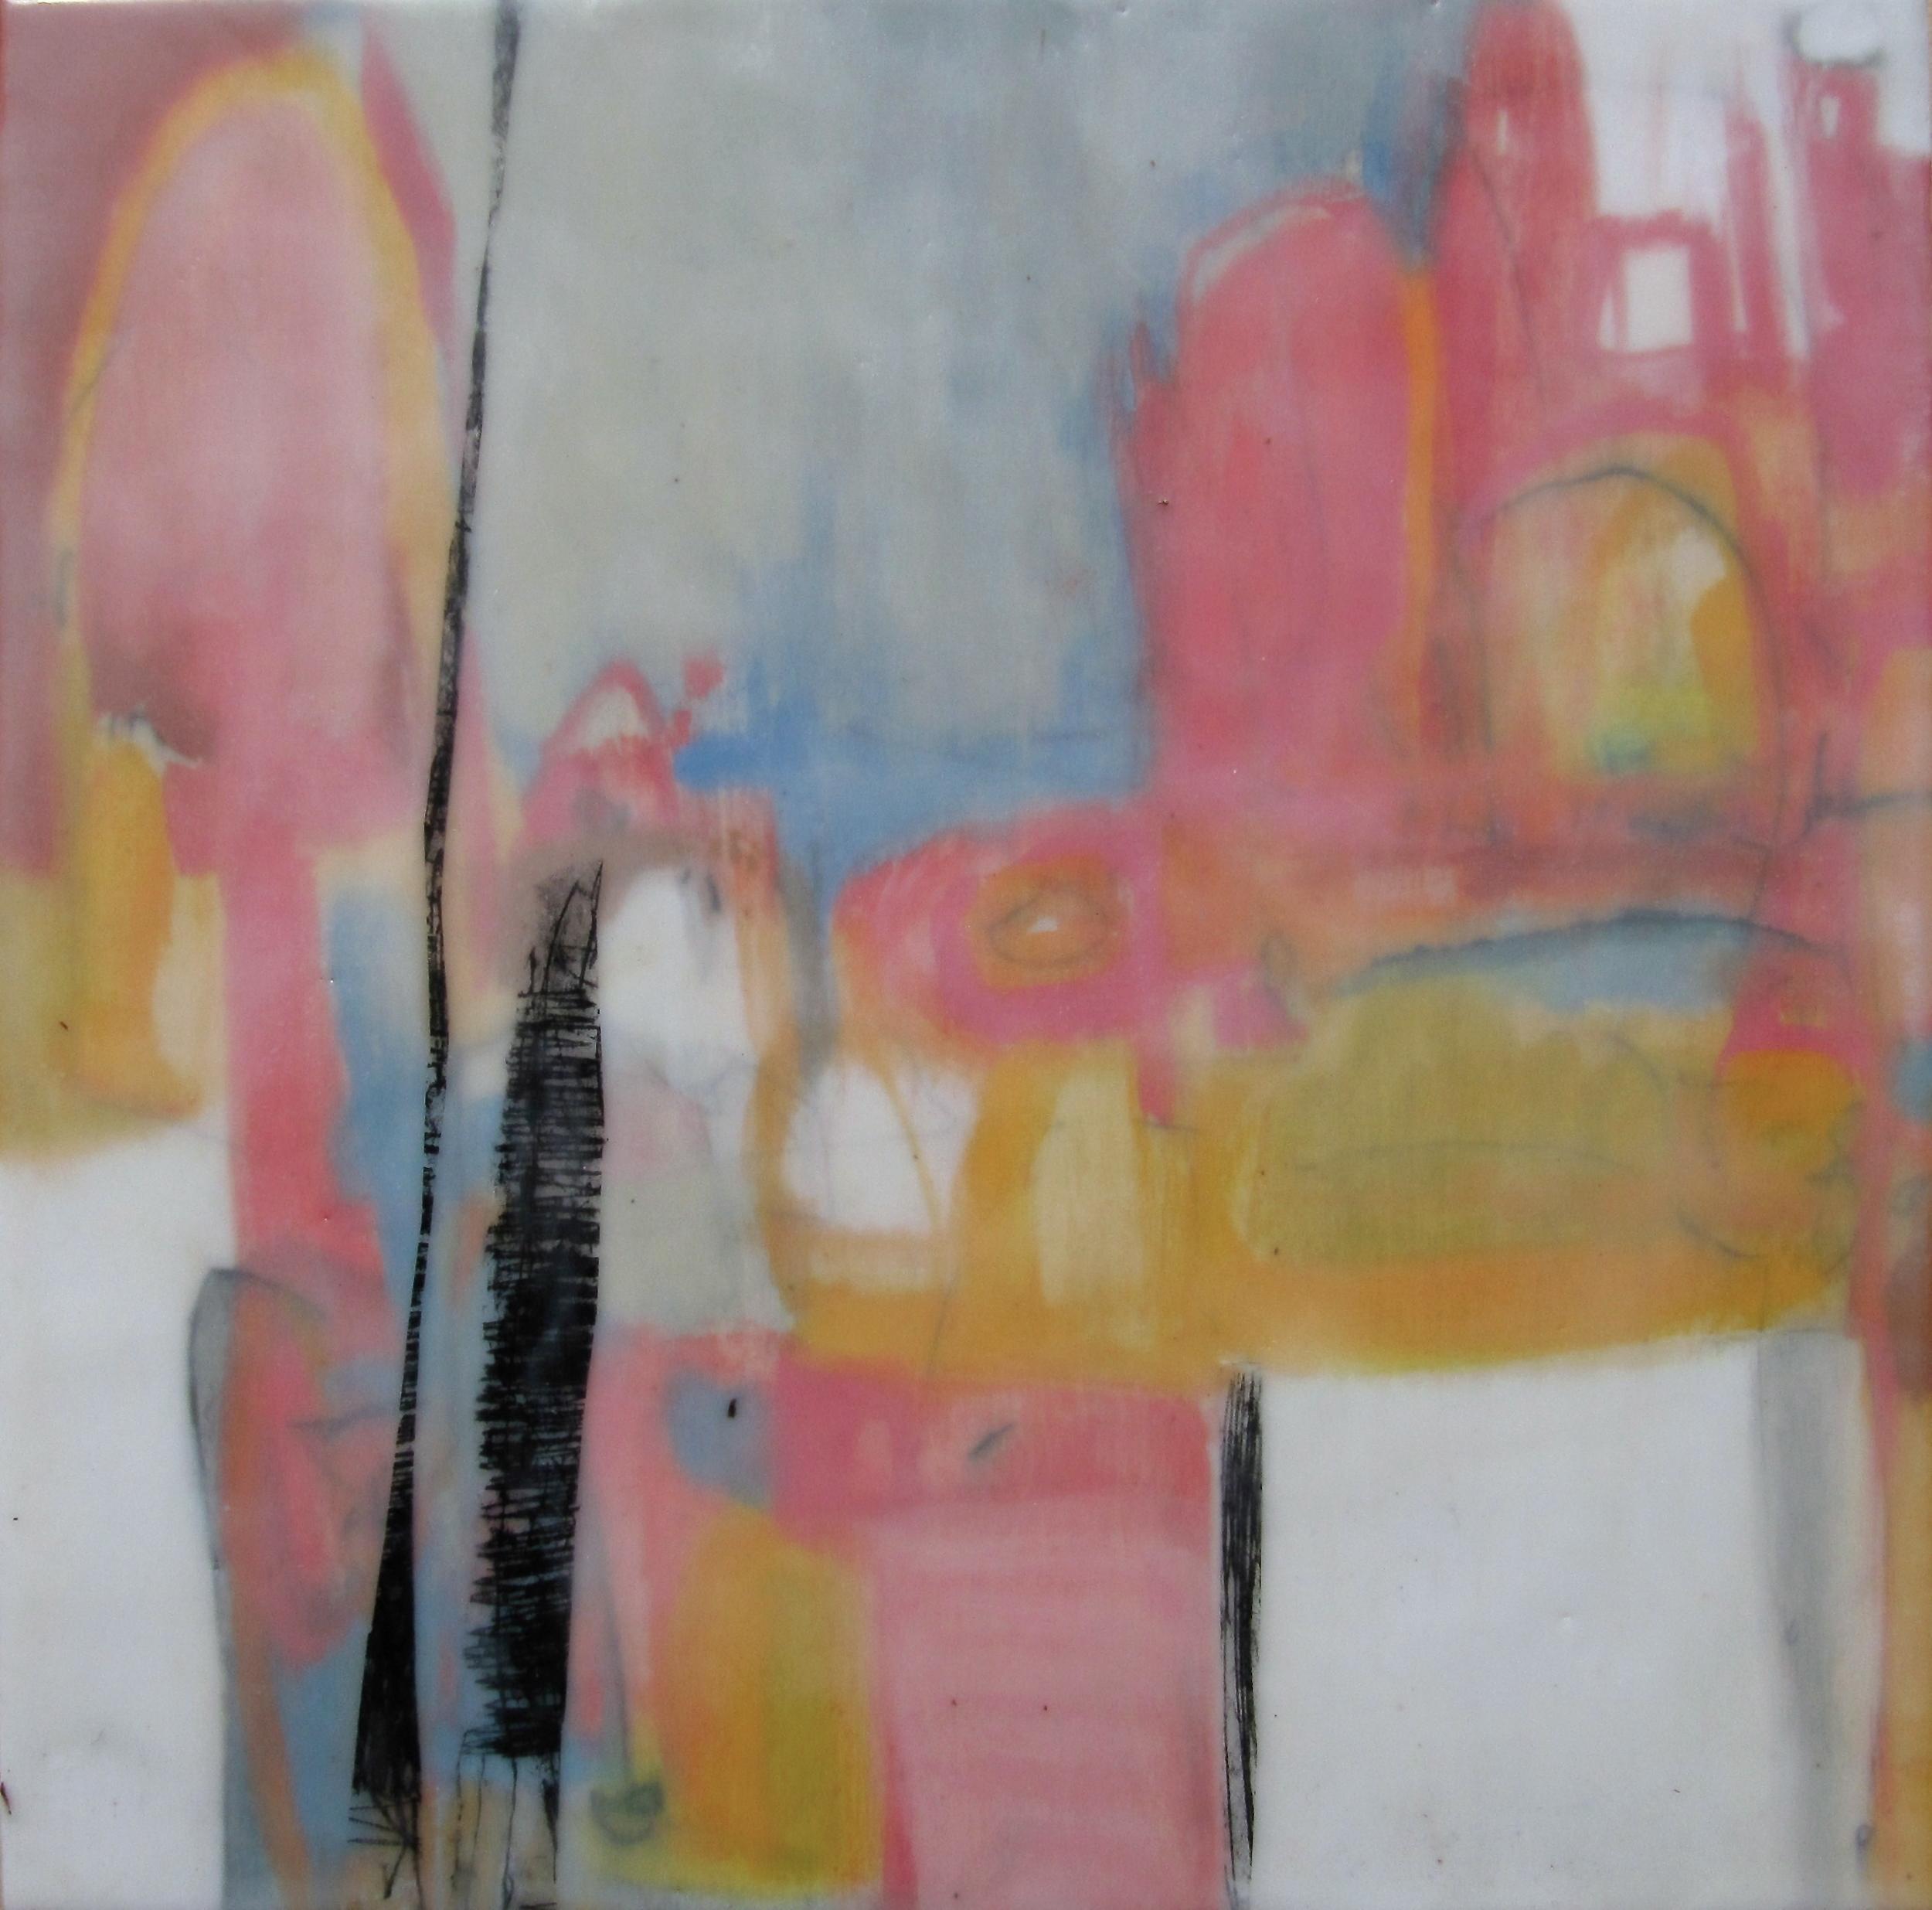 Dreamscape II, 2009 / Encaustic on wood panel, 12 x 12 / Sold